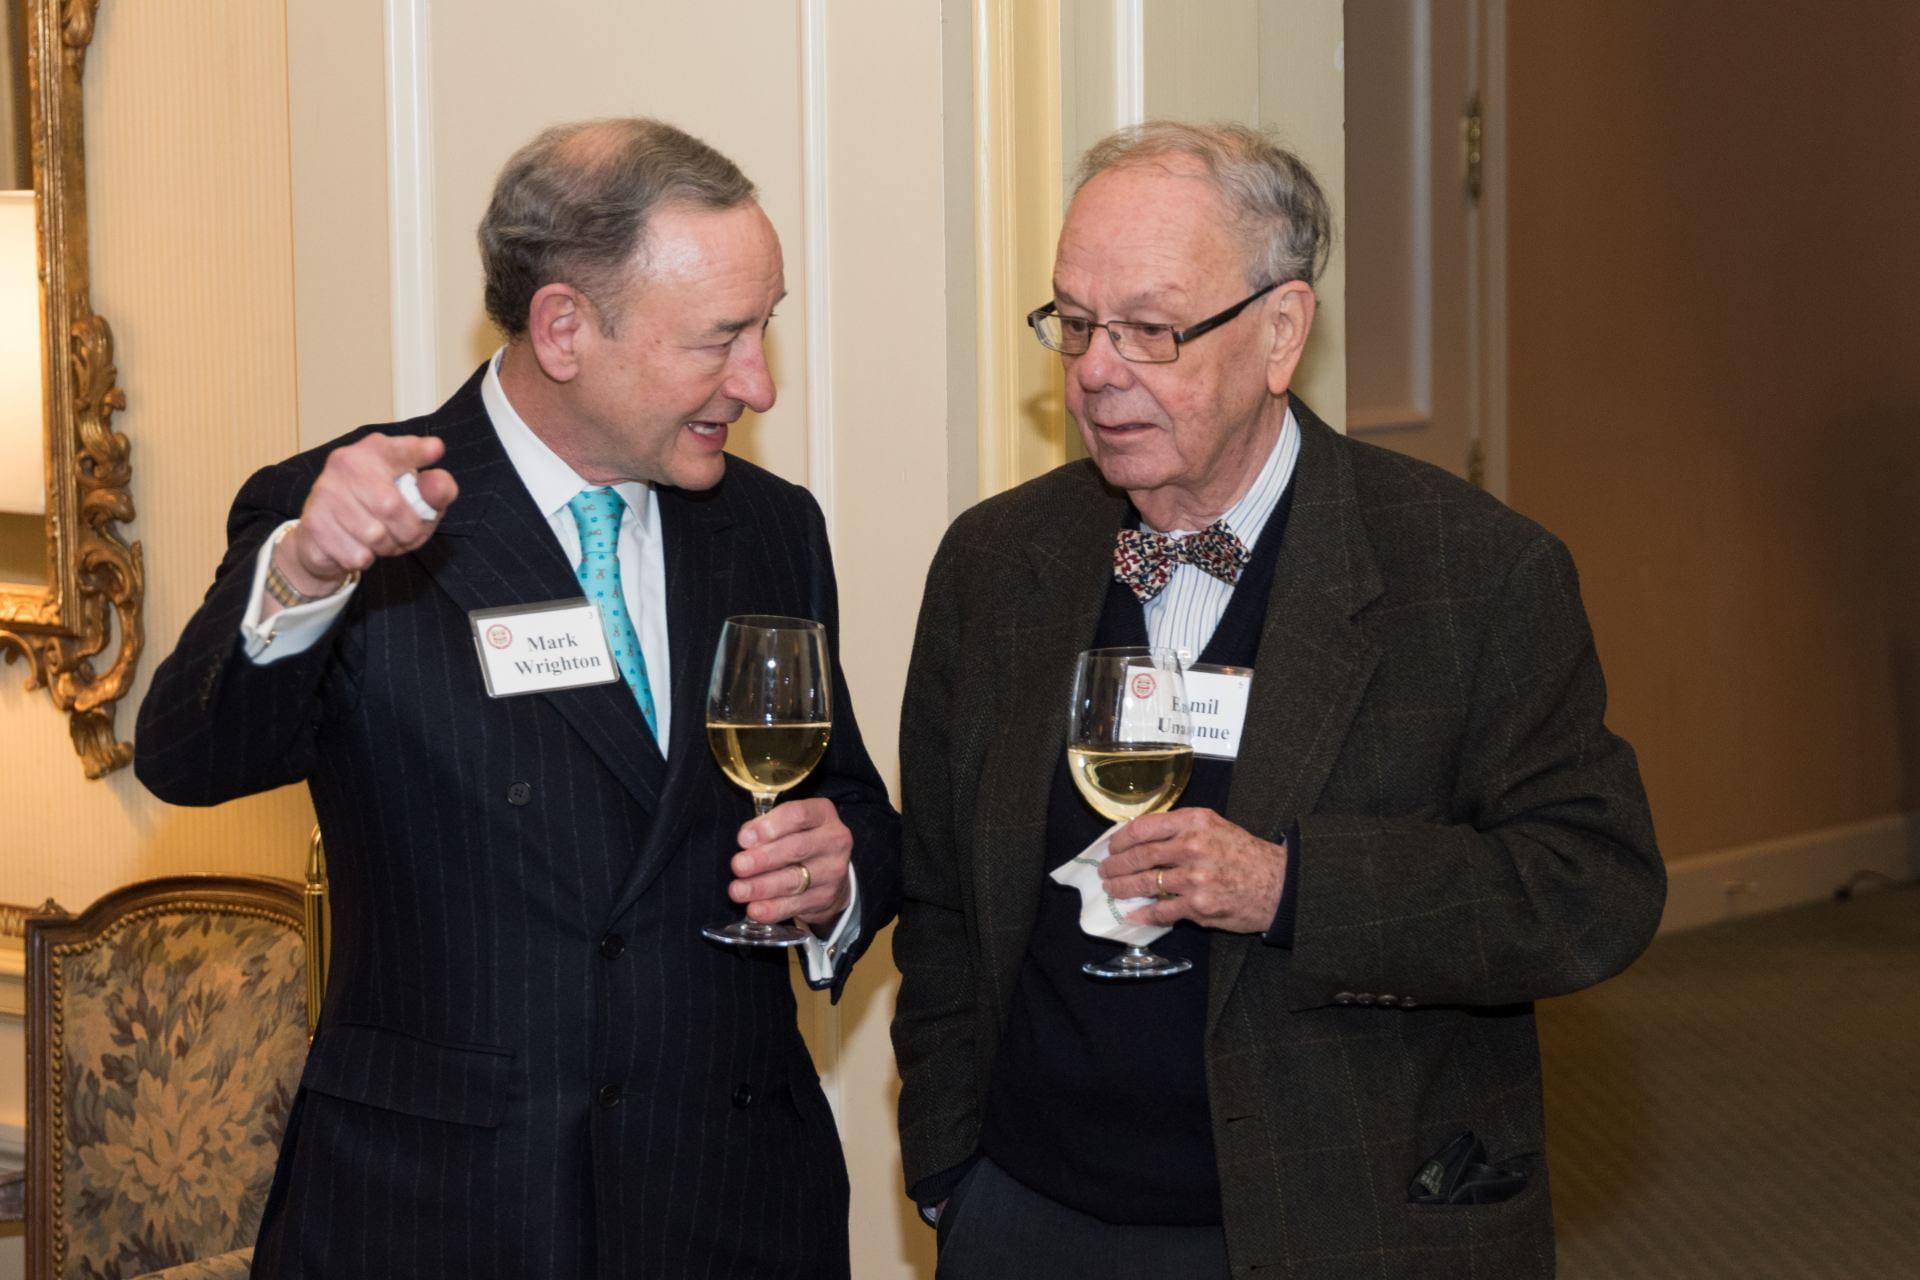 Chancellor Wrighton and Dr. Emil Unanue, the Paul & Ellen Lacy Professor of Pathology & Immunology